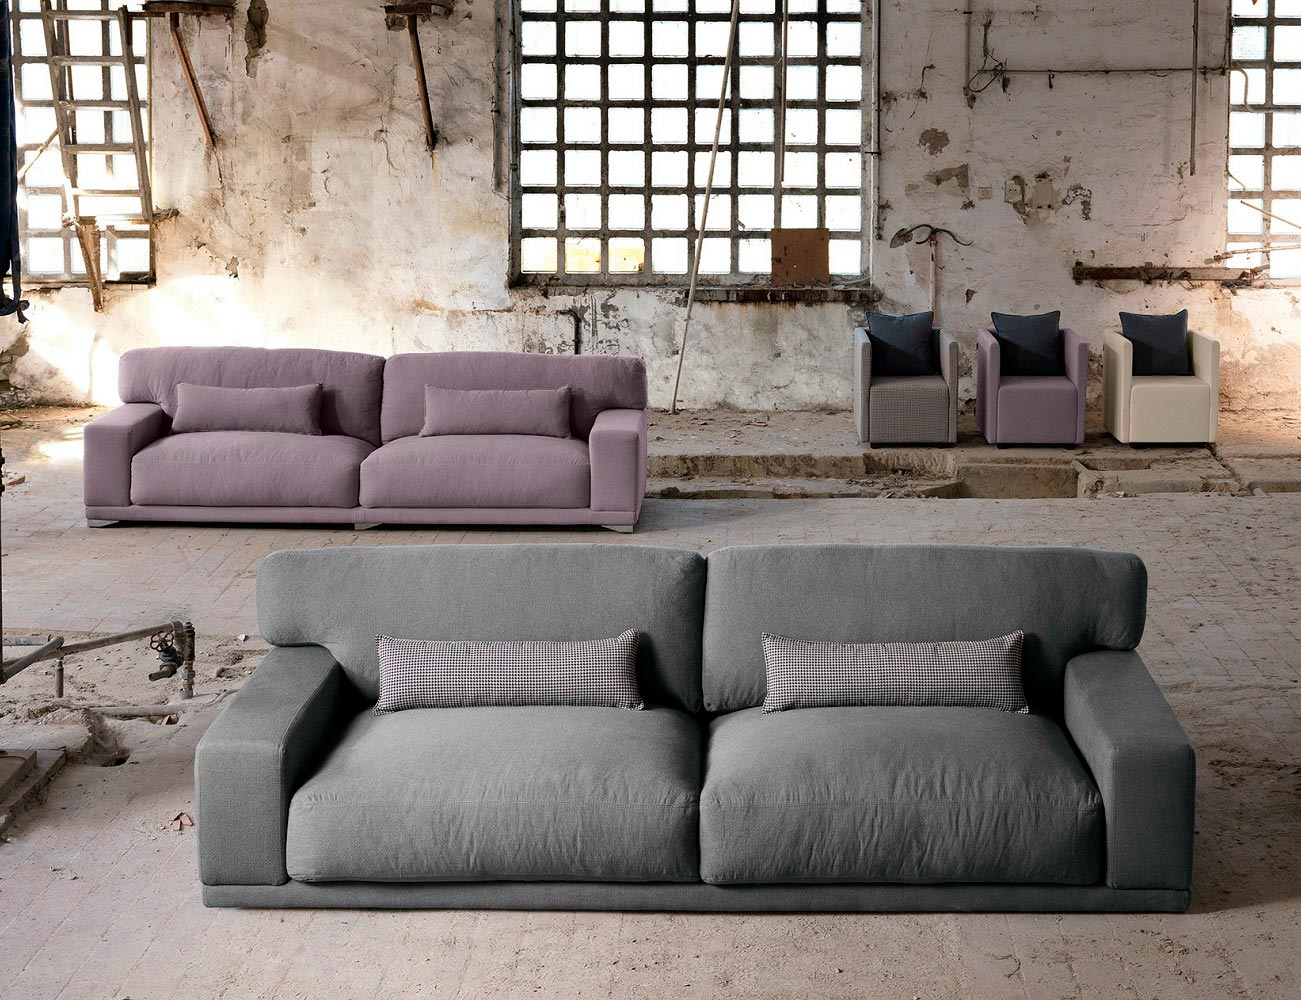 Doyle+Sofa